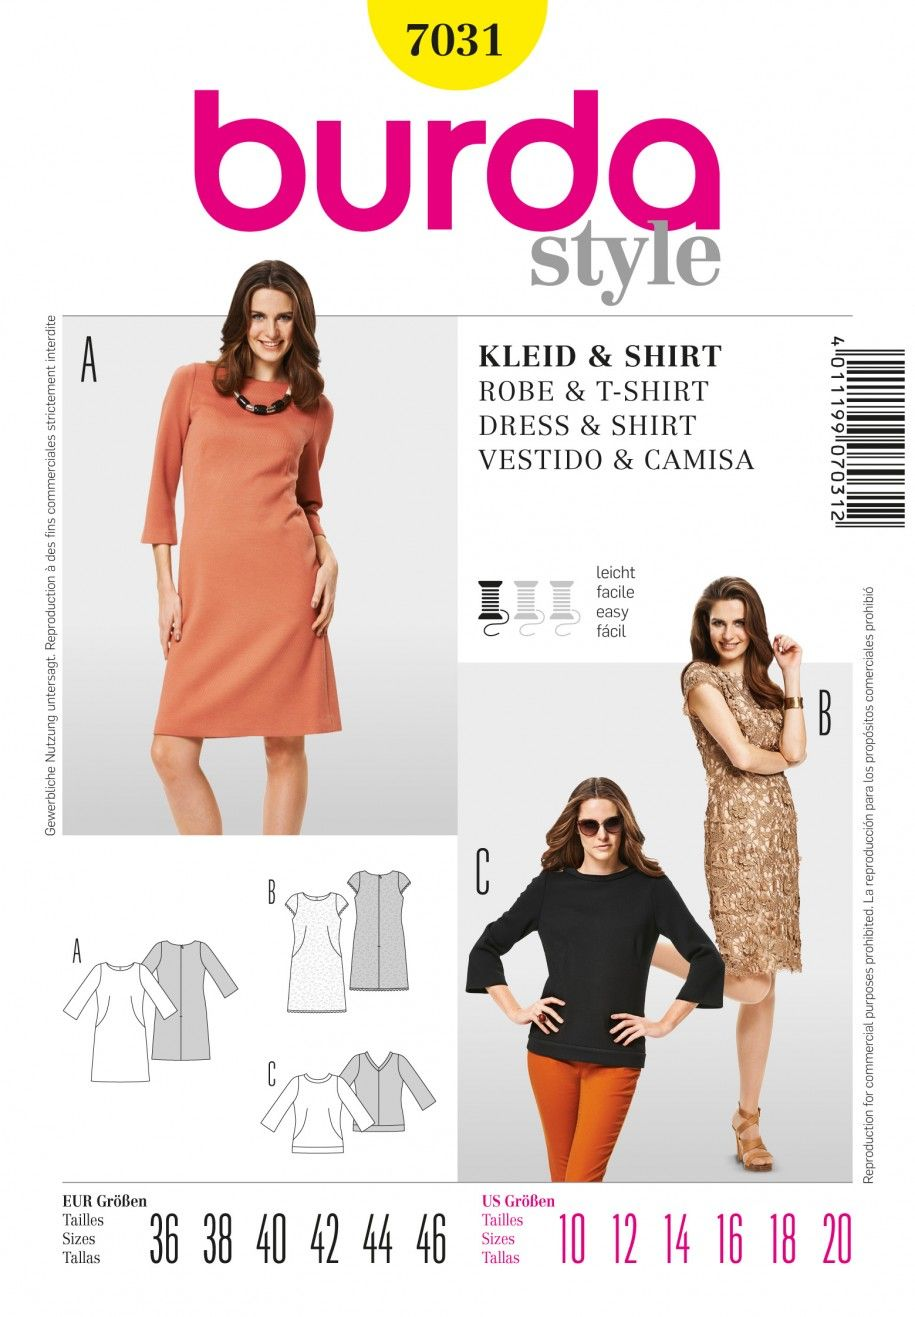 Burda B7031 Burda Style Dress & Shirt Sewing Pattern   Crafts and ...